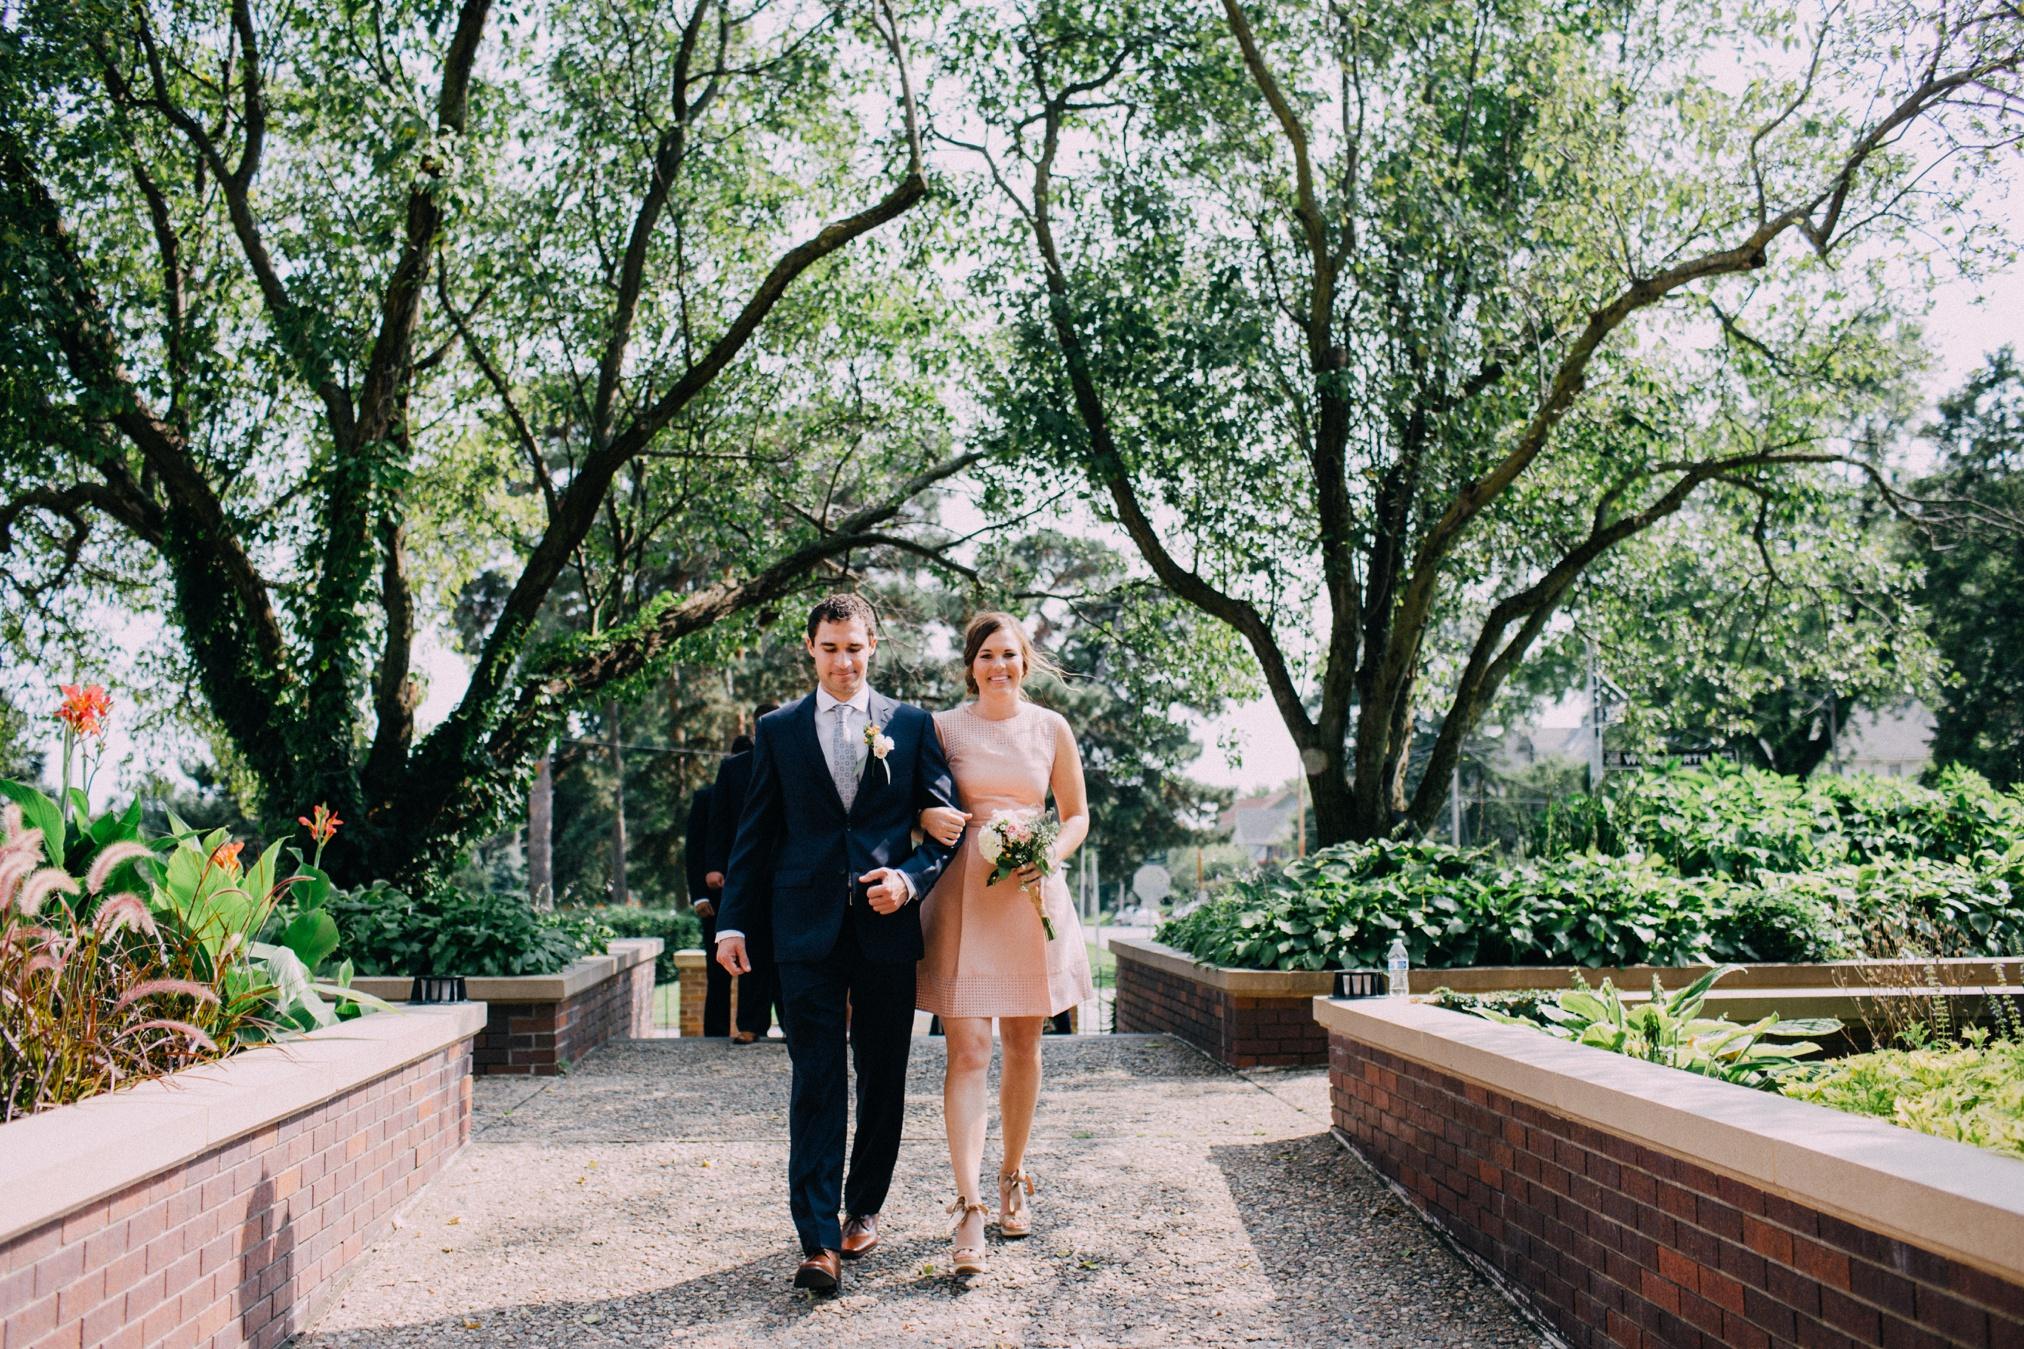 brenna+michael_wedding-362.jpg